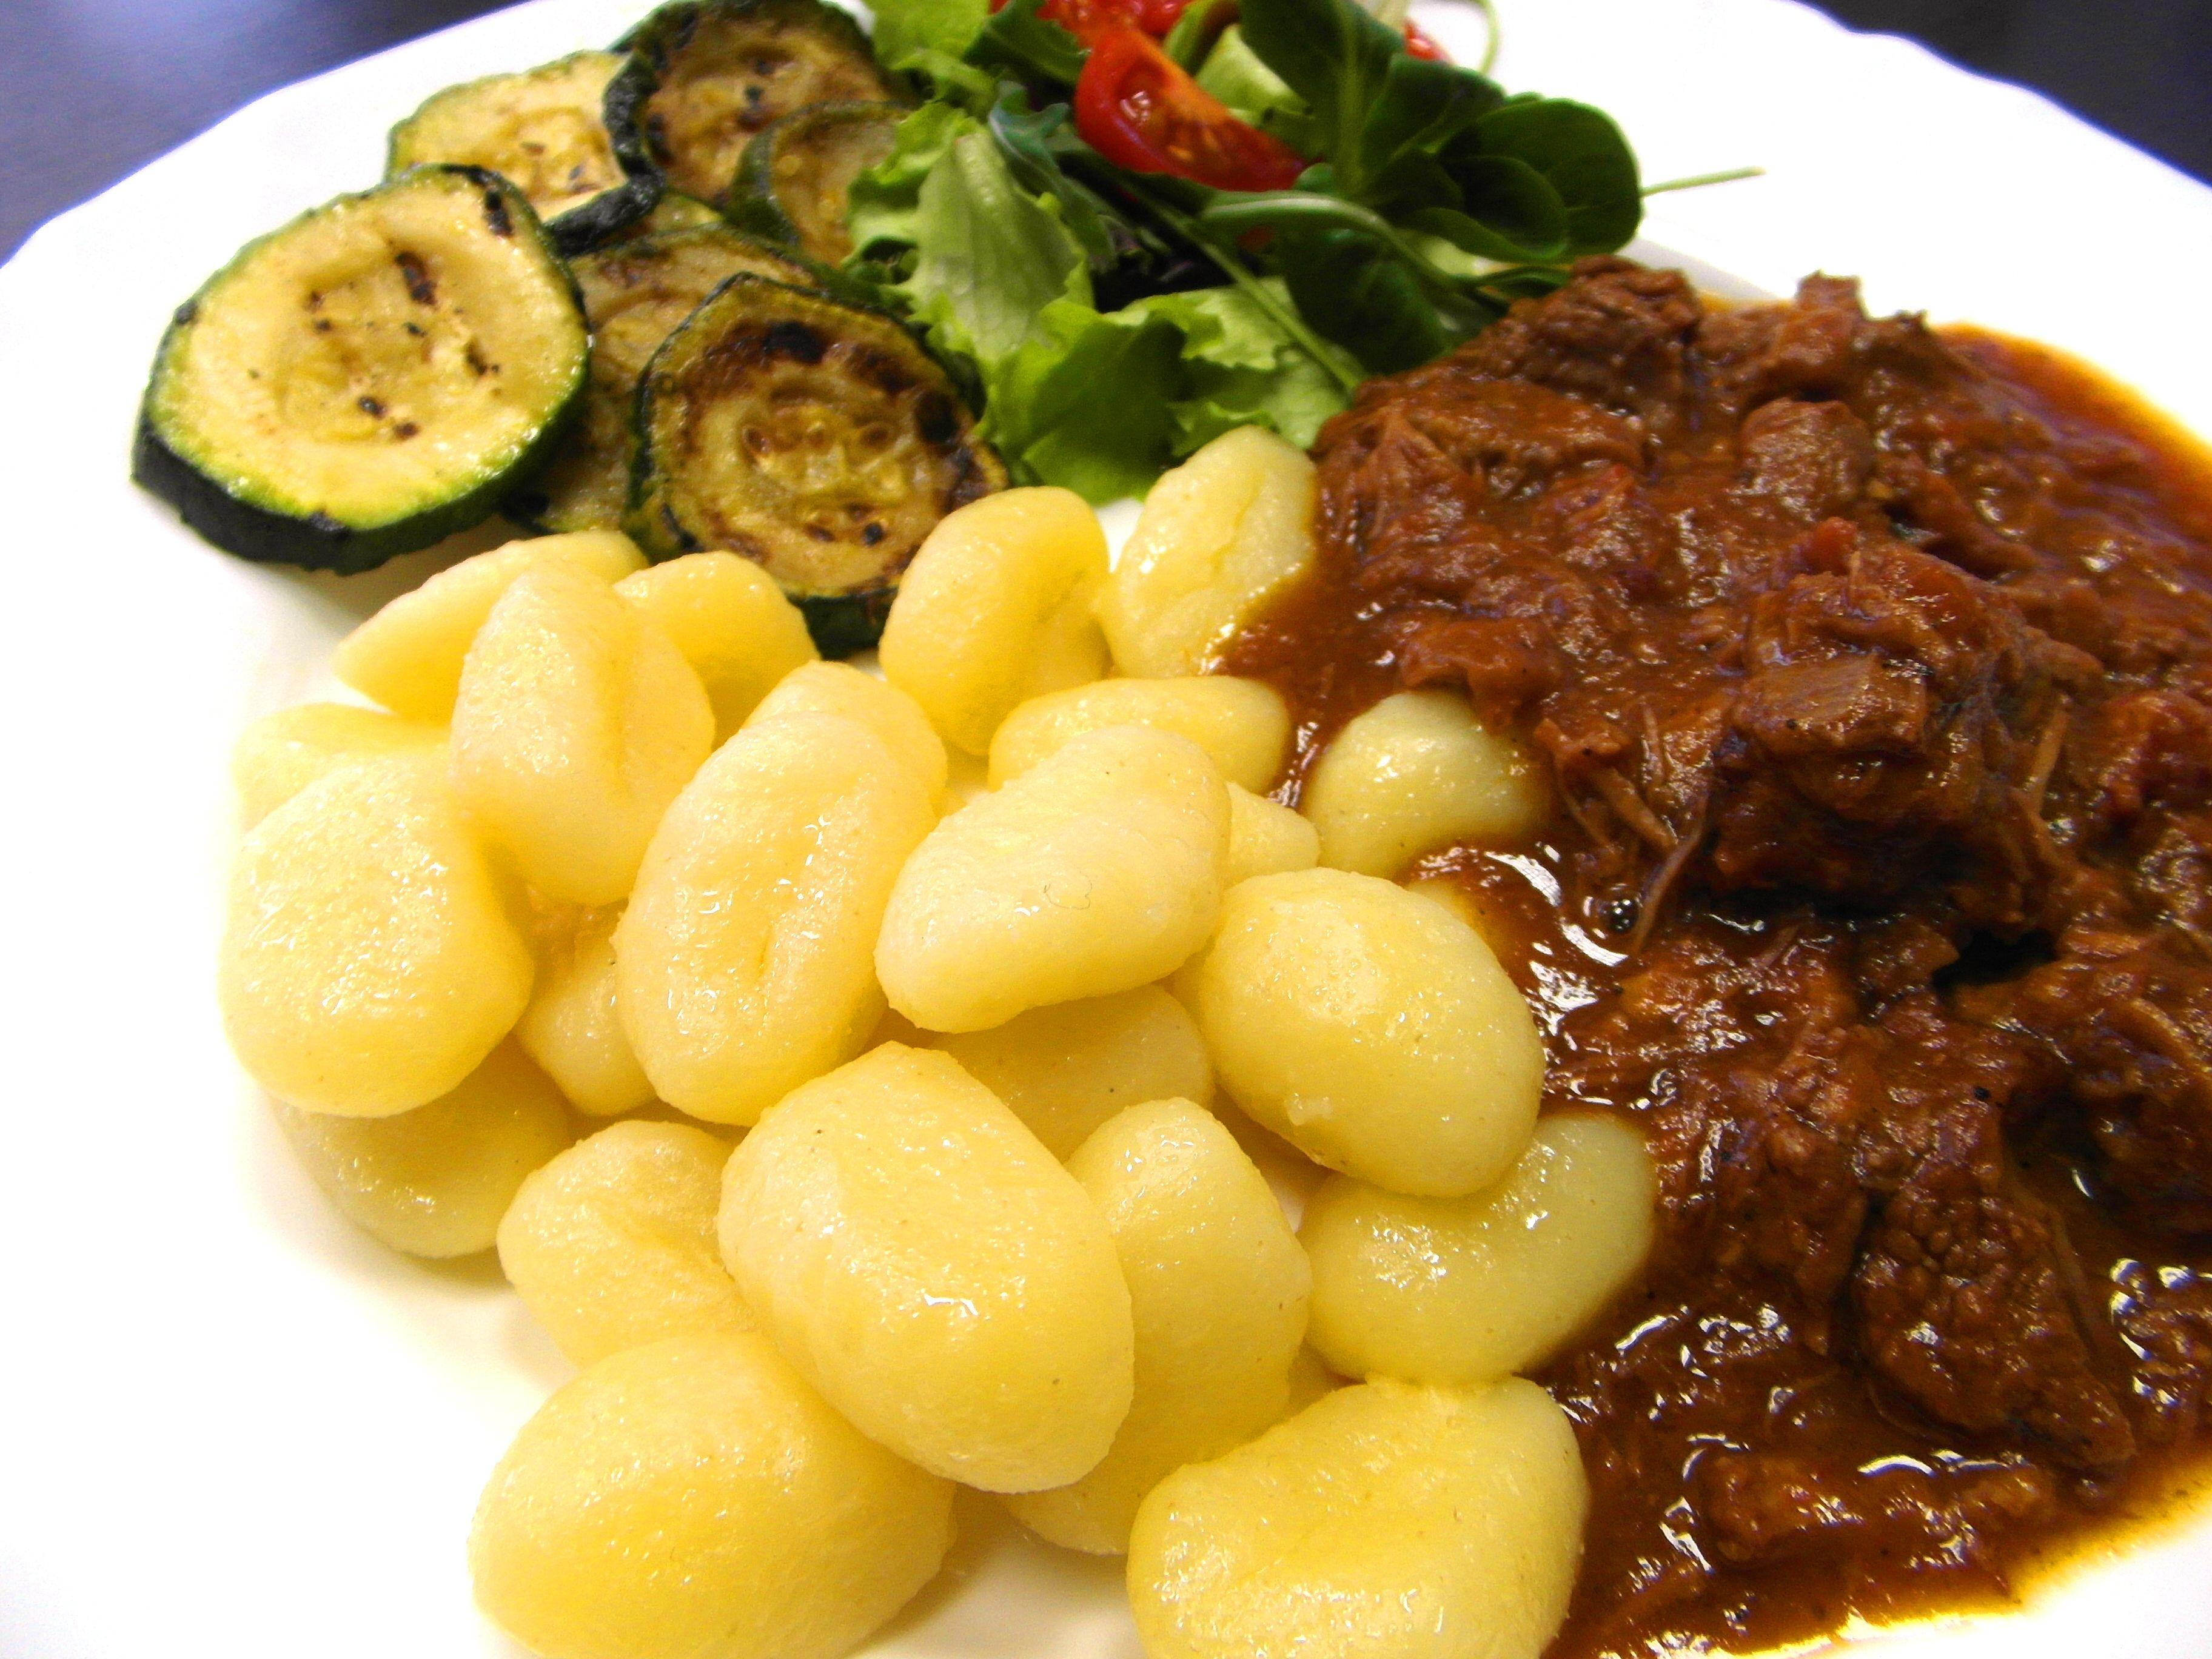 Hovädzí guláš s ňokmi a zeleninou obedová klasika - www.inmedio.sk  #gulas #noky #zelenina #obed #inmedio #jedlo #dobrejedlo